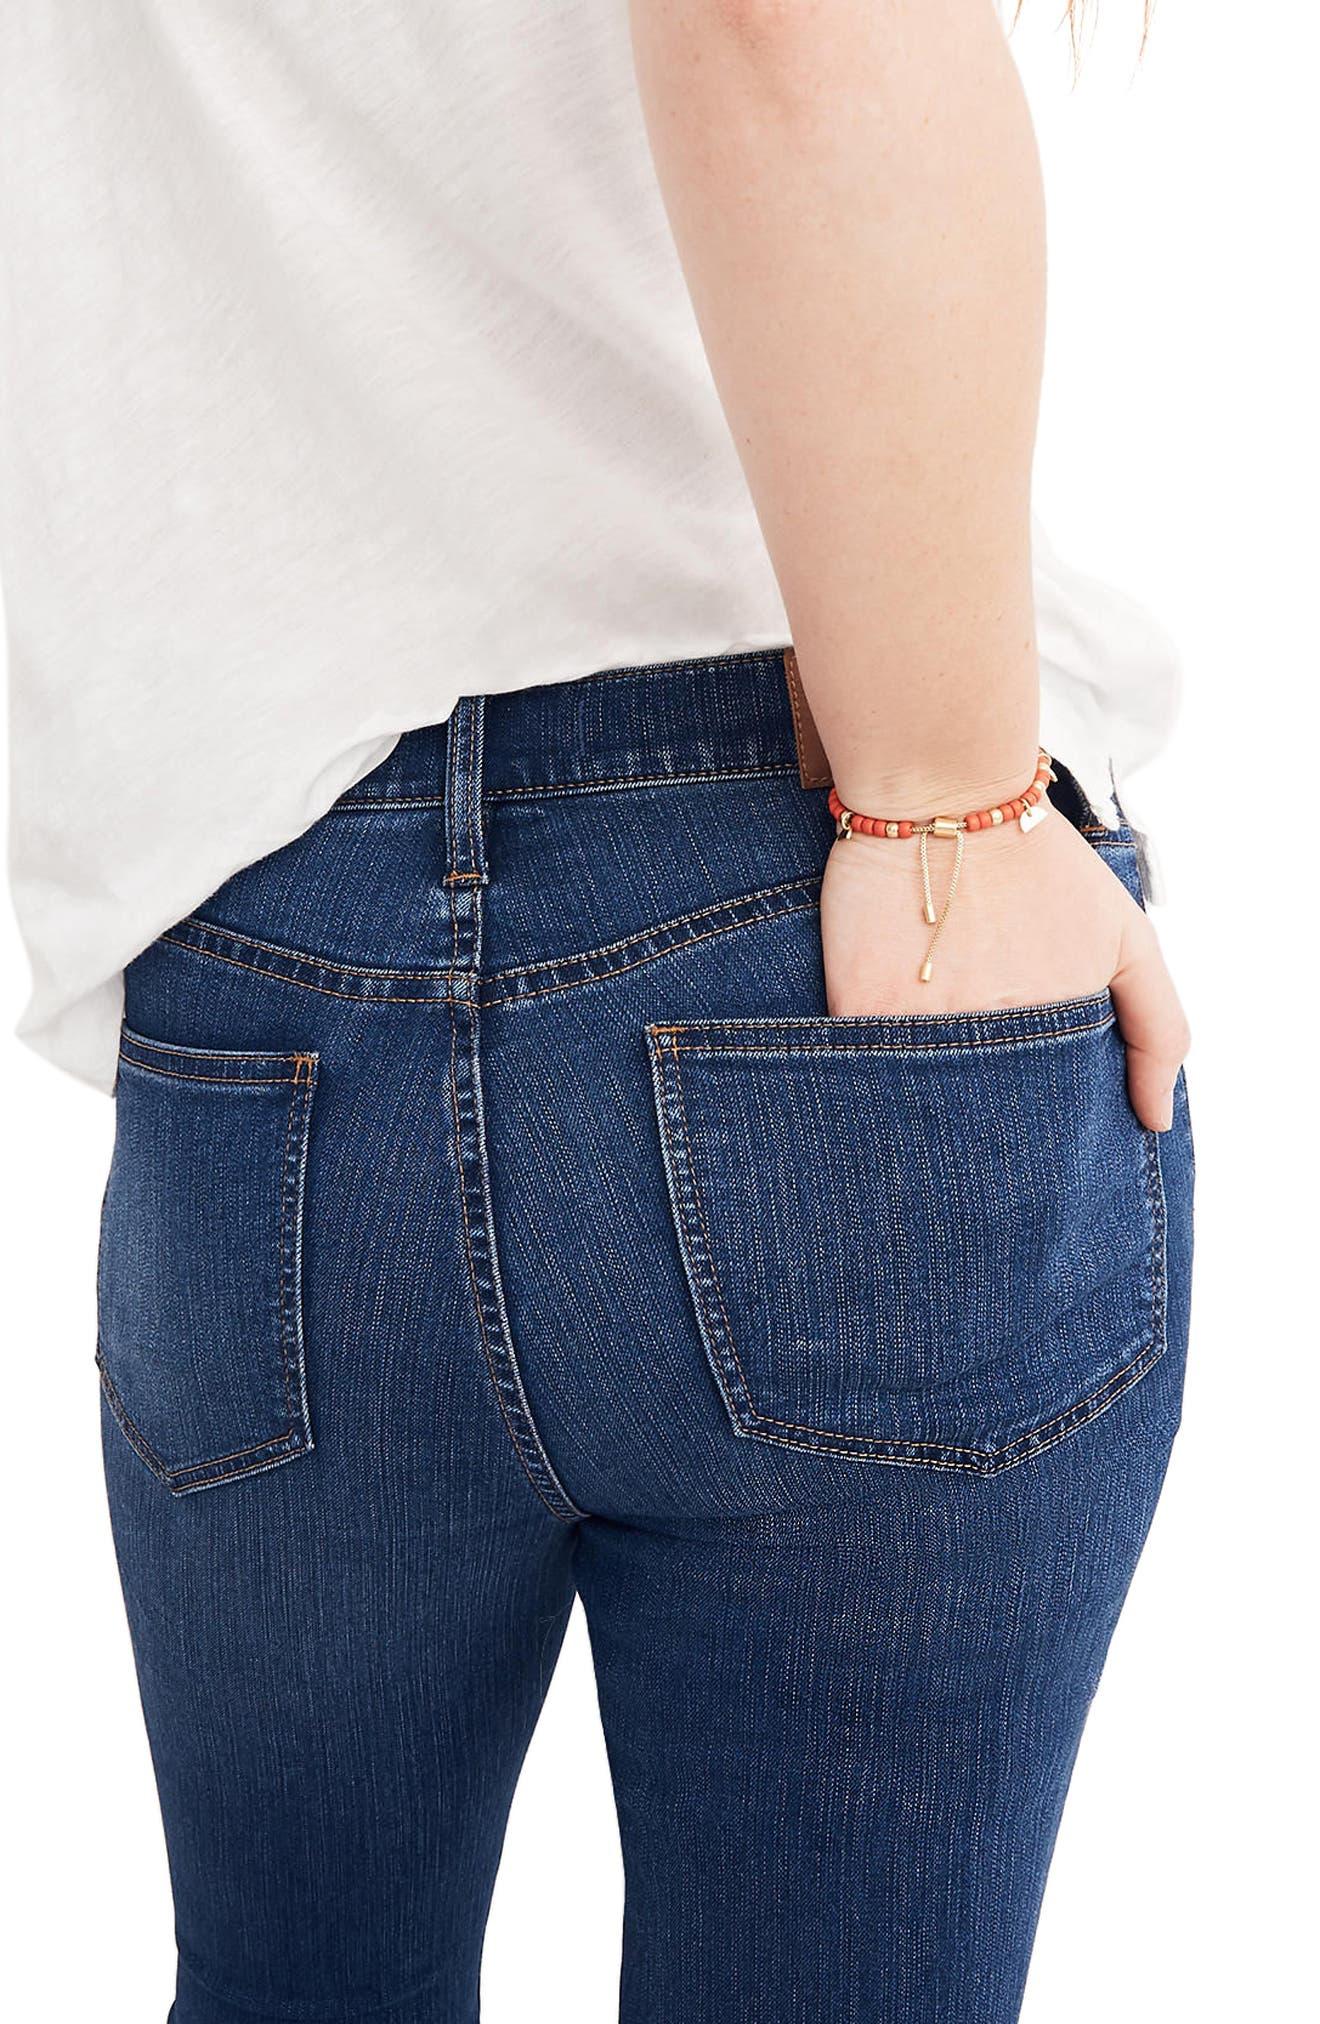 Roadtripper High Waist Skinny Jeans,                             Alternate thumbnail 3, color,                             Orson Wash